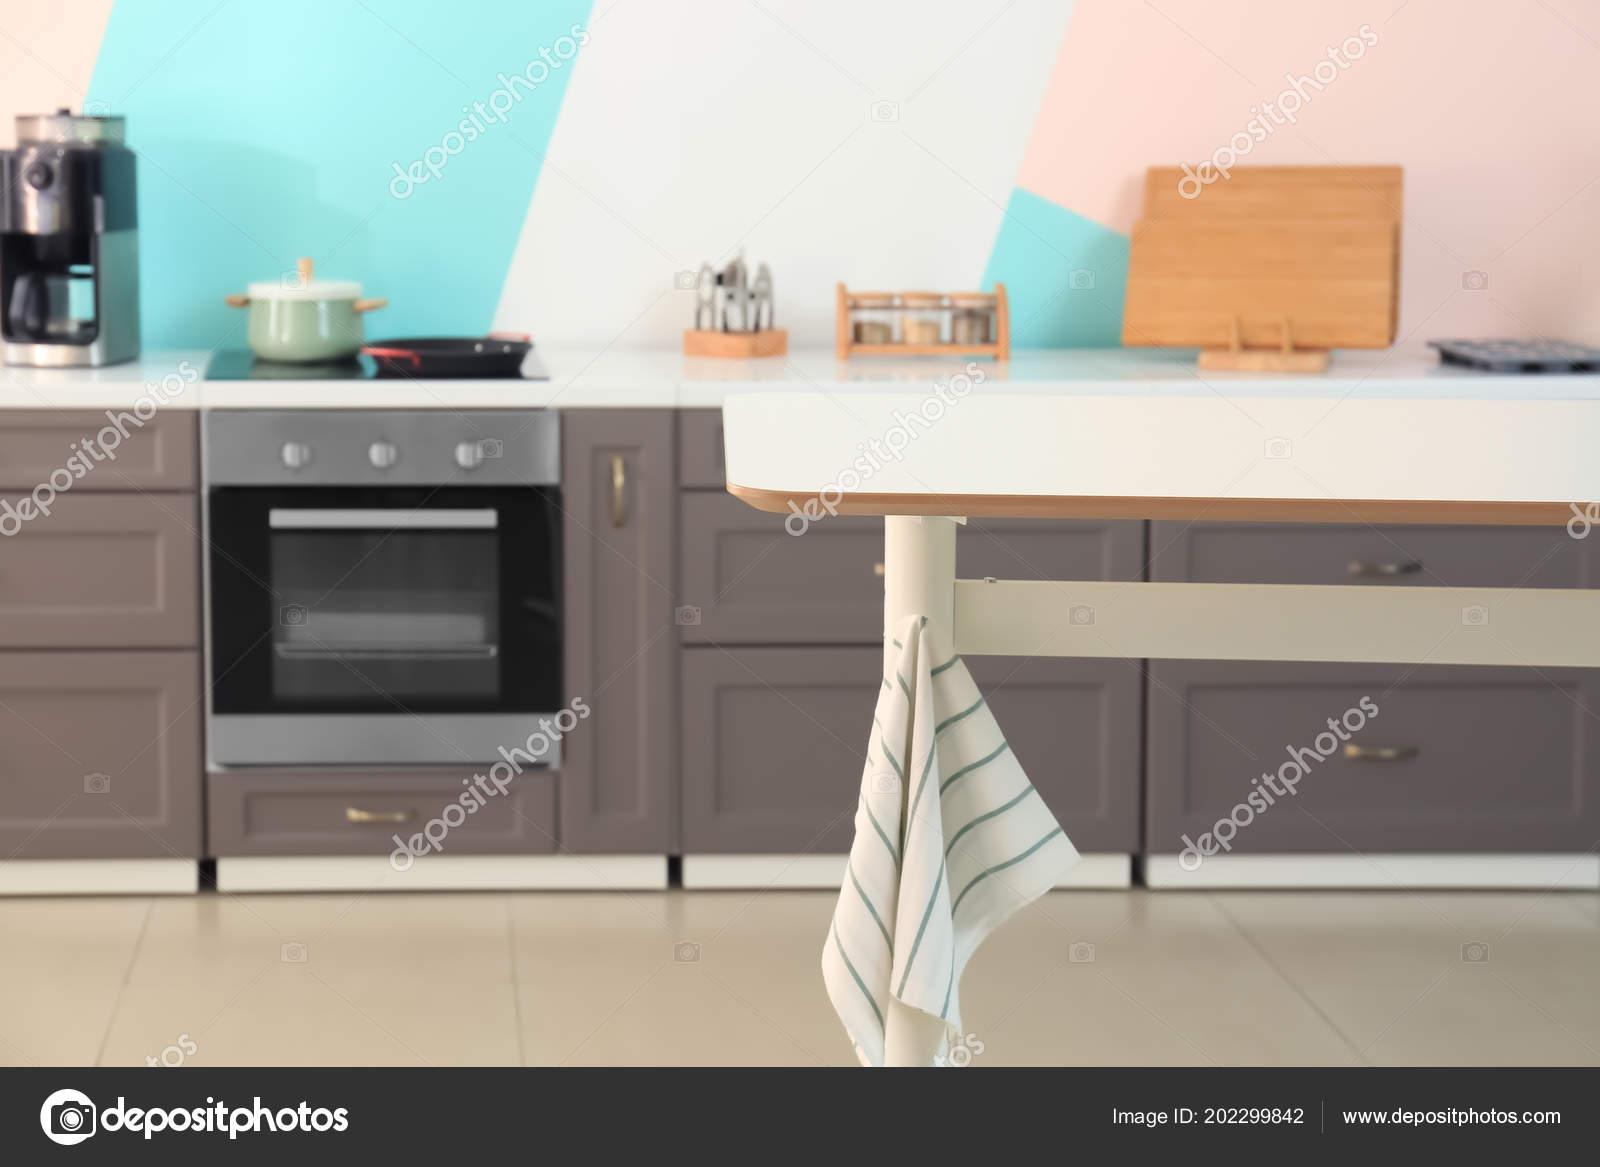 Mesa de cocina moderna — Foto de stock © belchonock #202299842